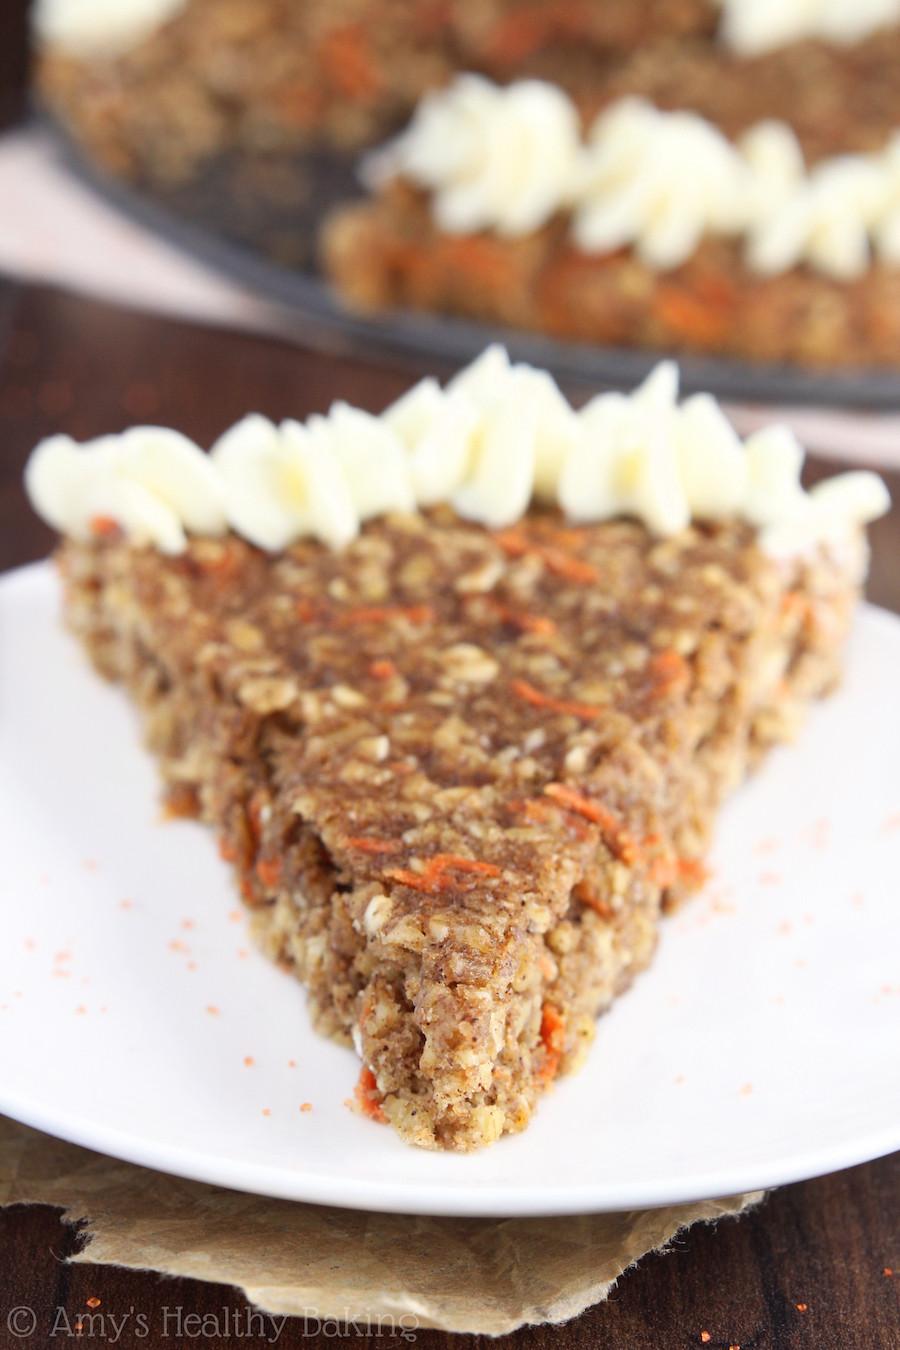 Oatmeal Dessert Recipe  Carrot Cake Oatmeal Cookie Cake